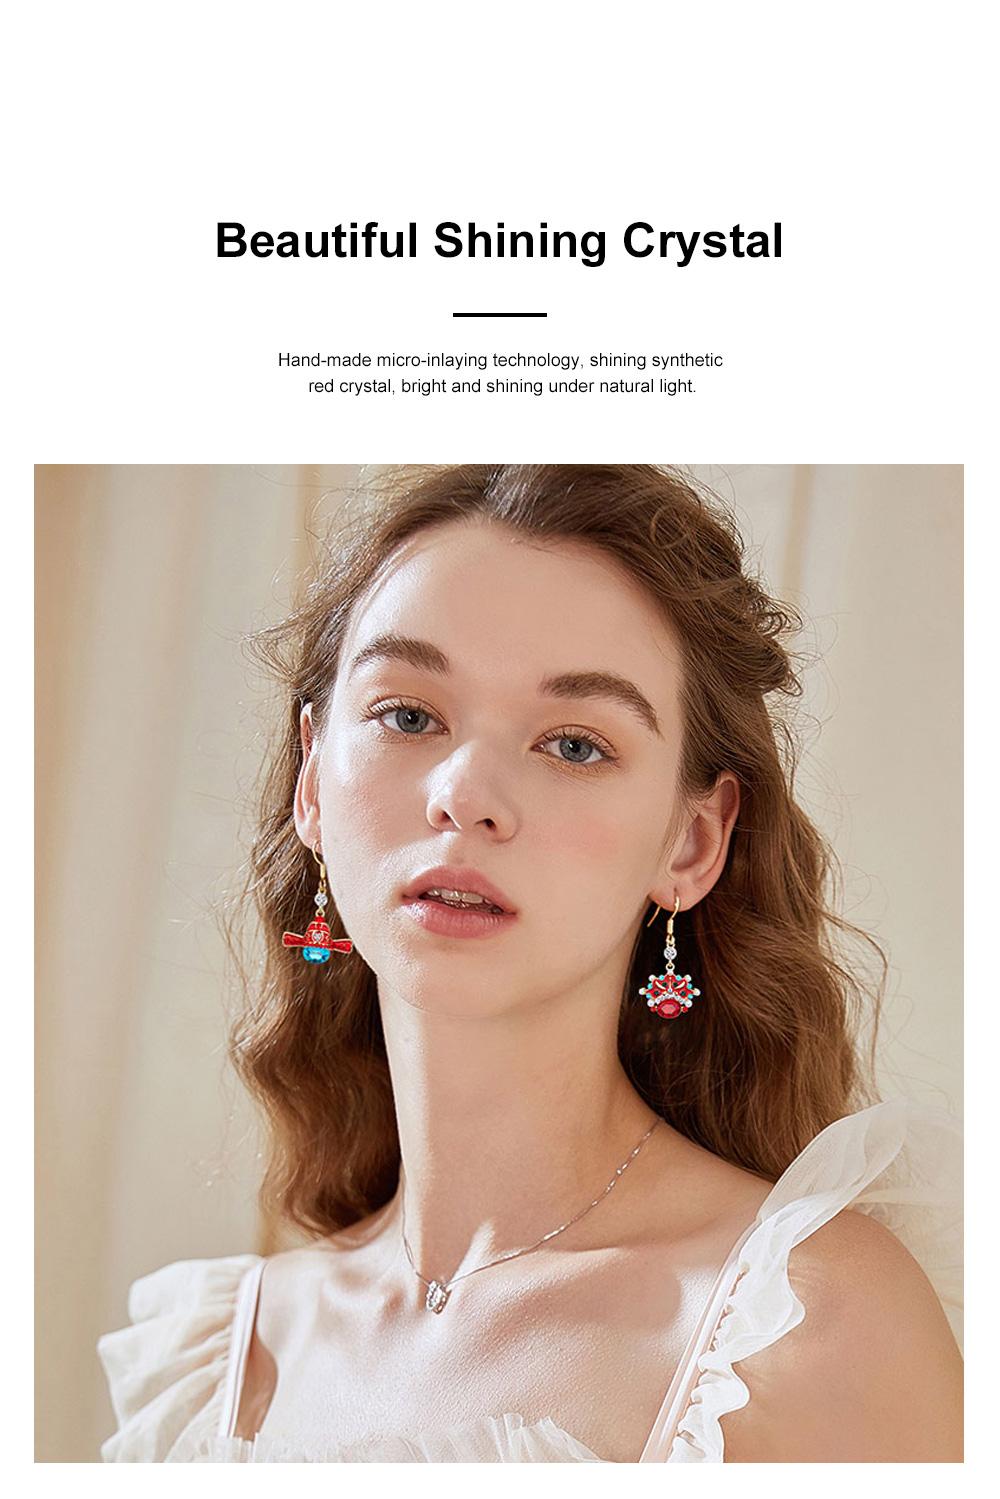 Chinese Style Dangle Earrings Asymmetric Personality Crystal Earrings Bride Groom Earrings Studs 1